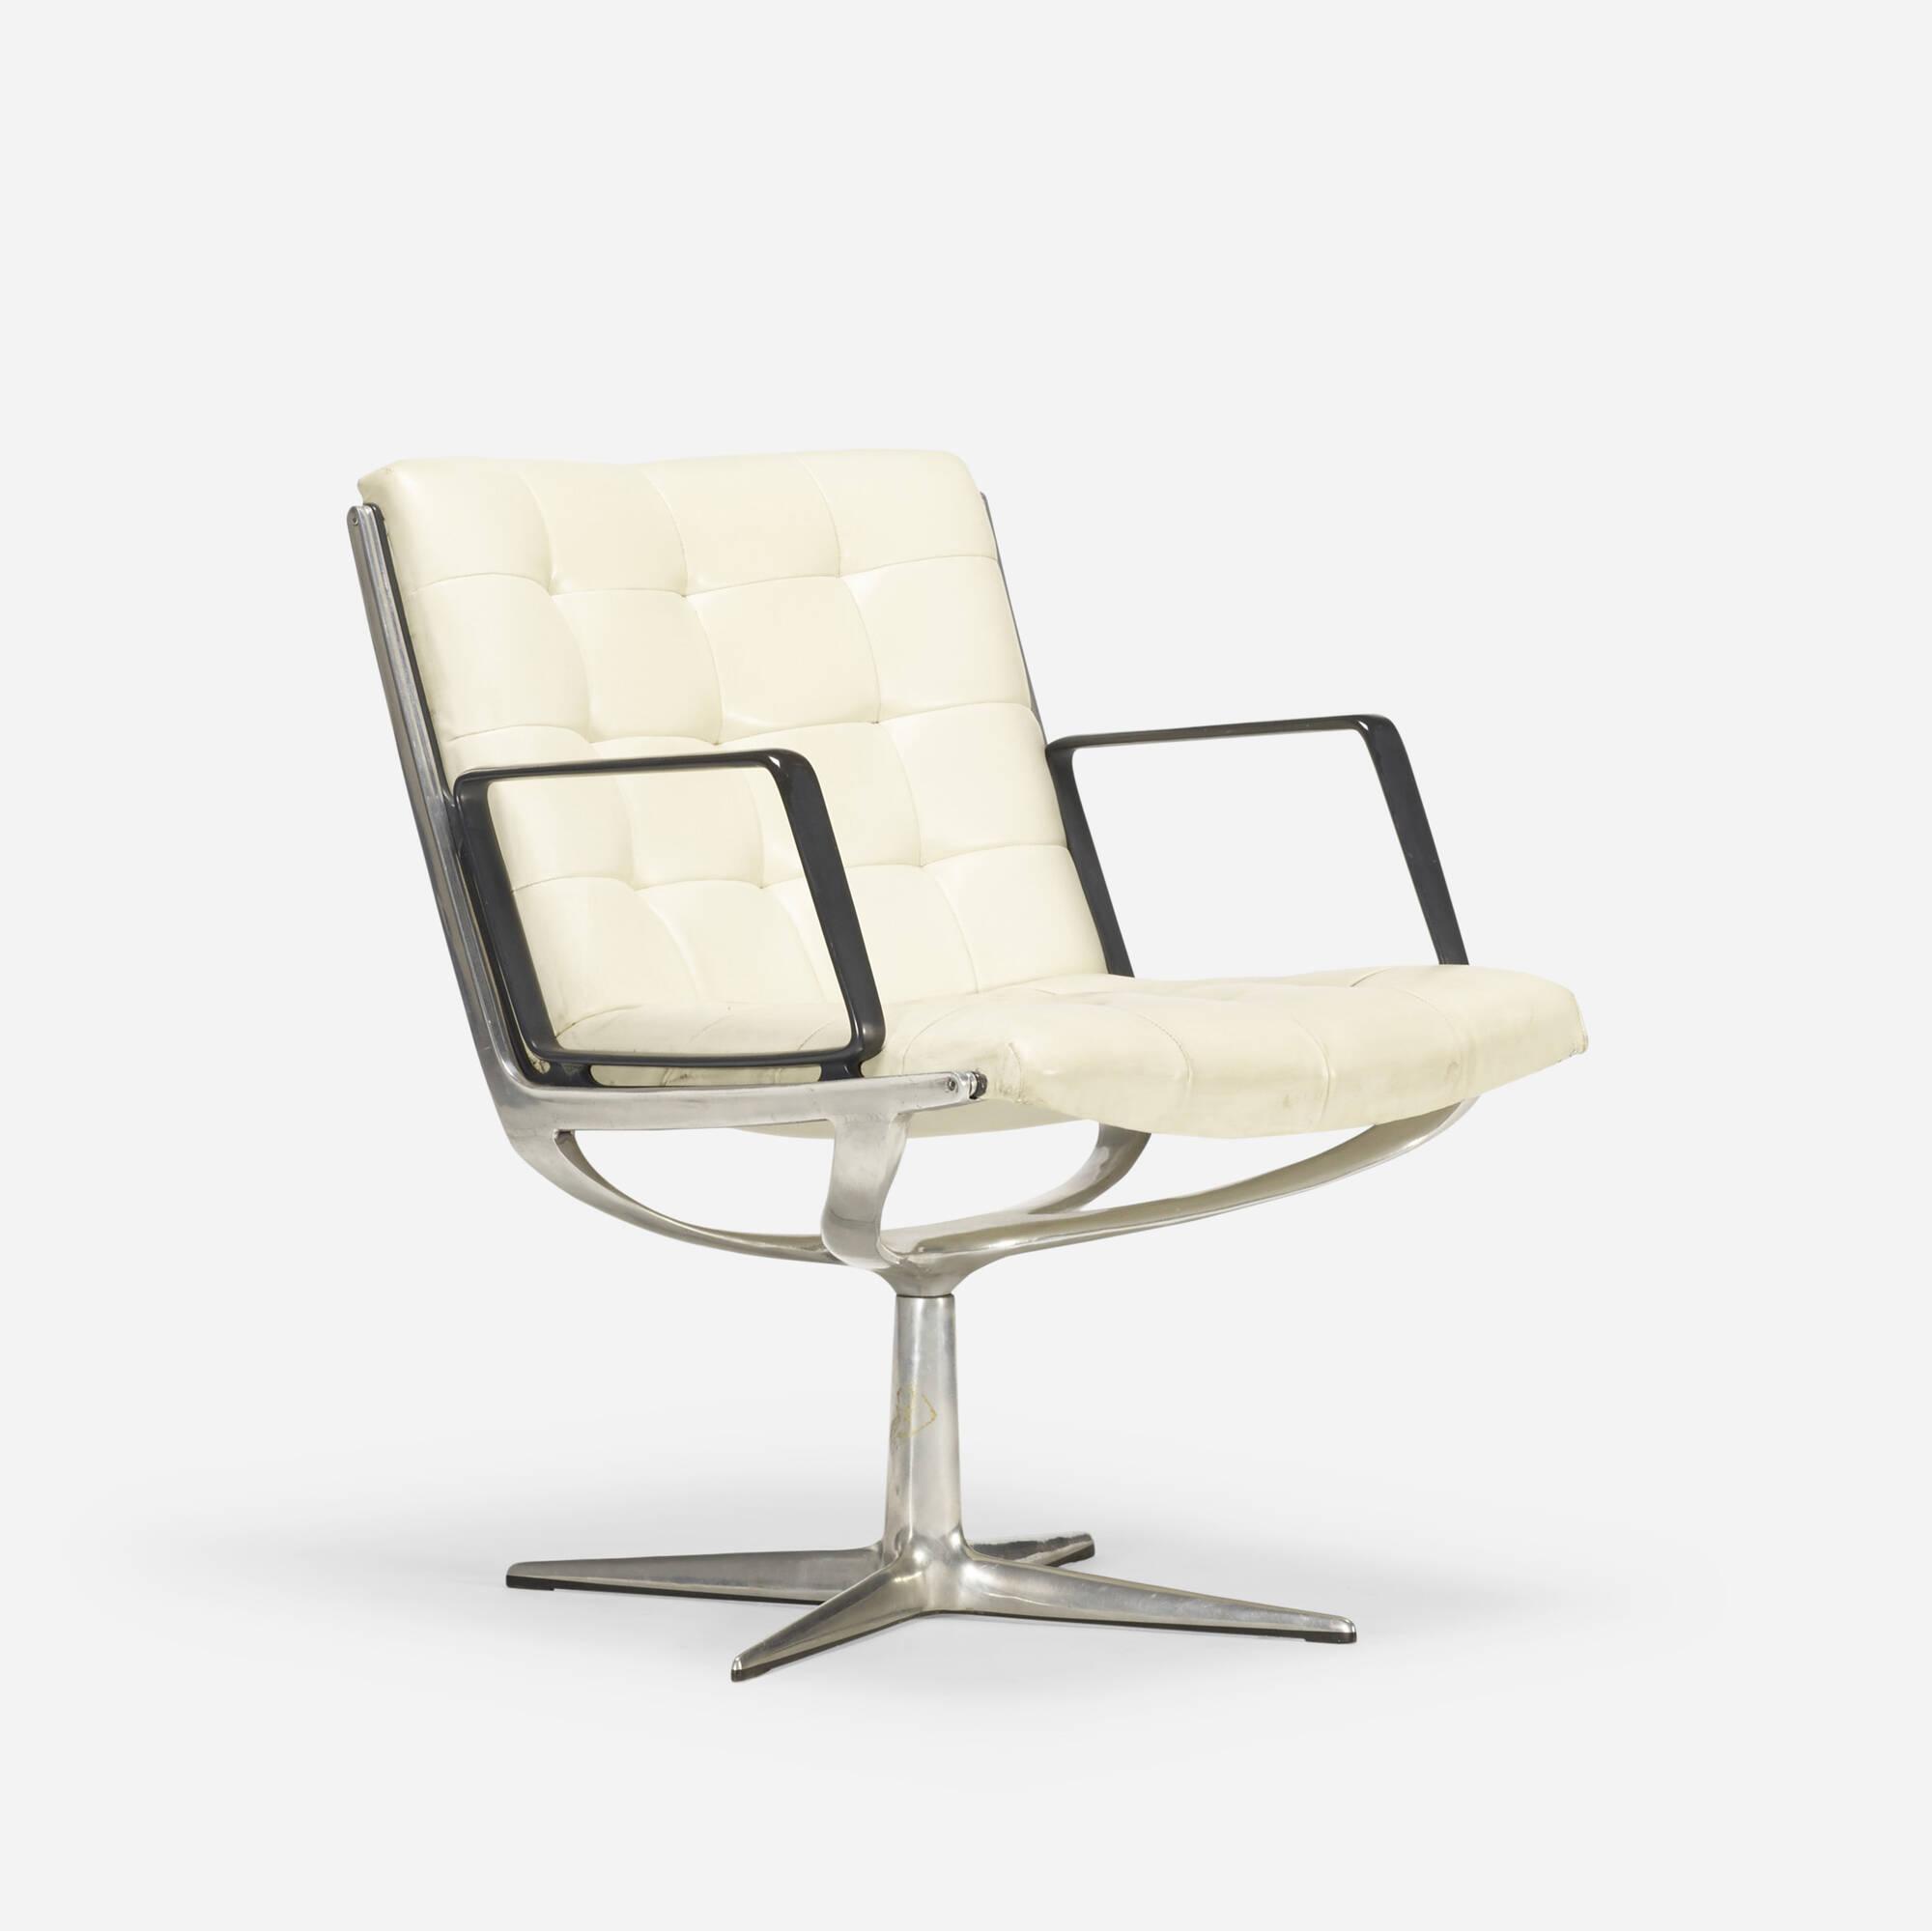 124: American / armchair (1 of 3)